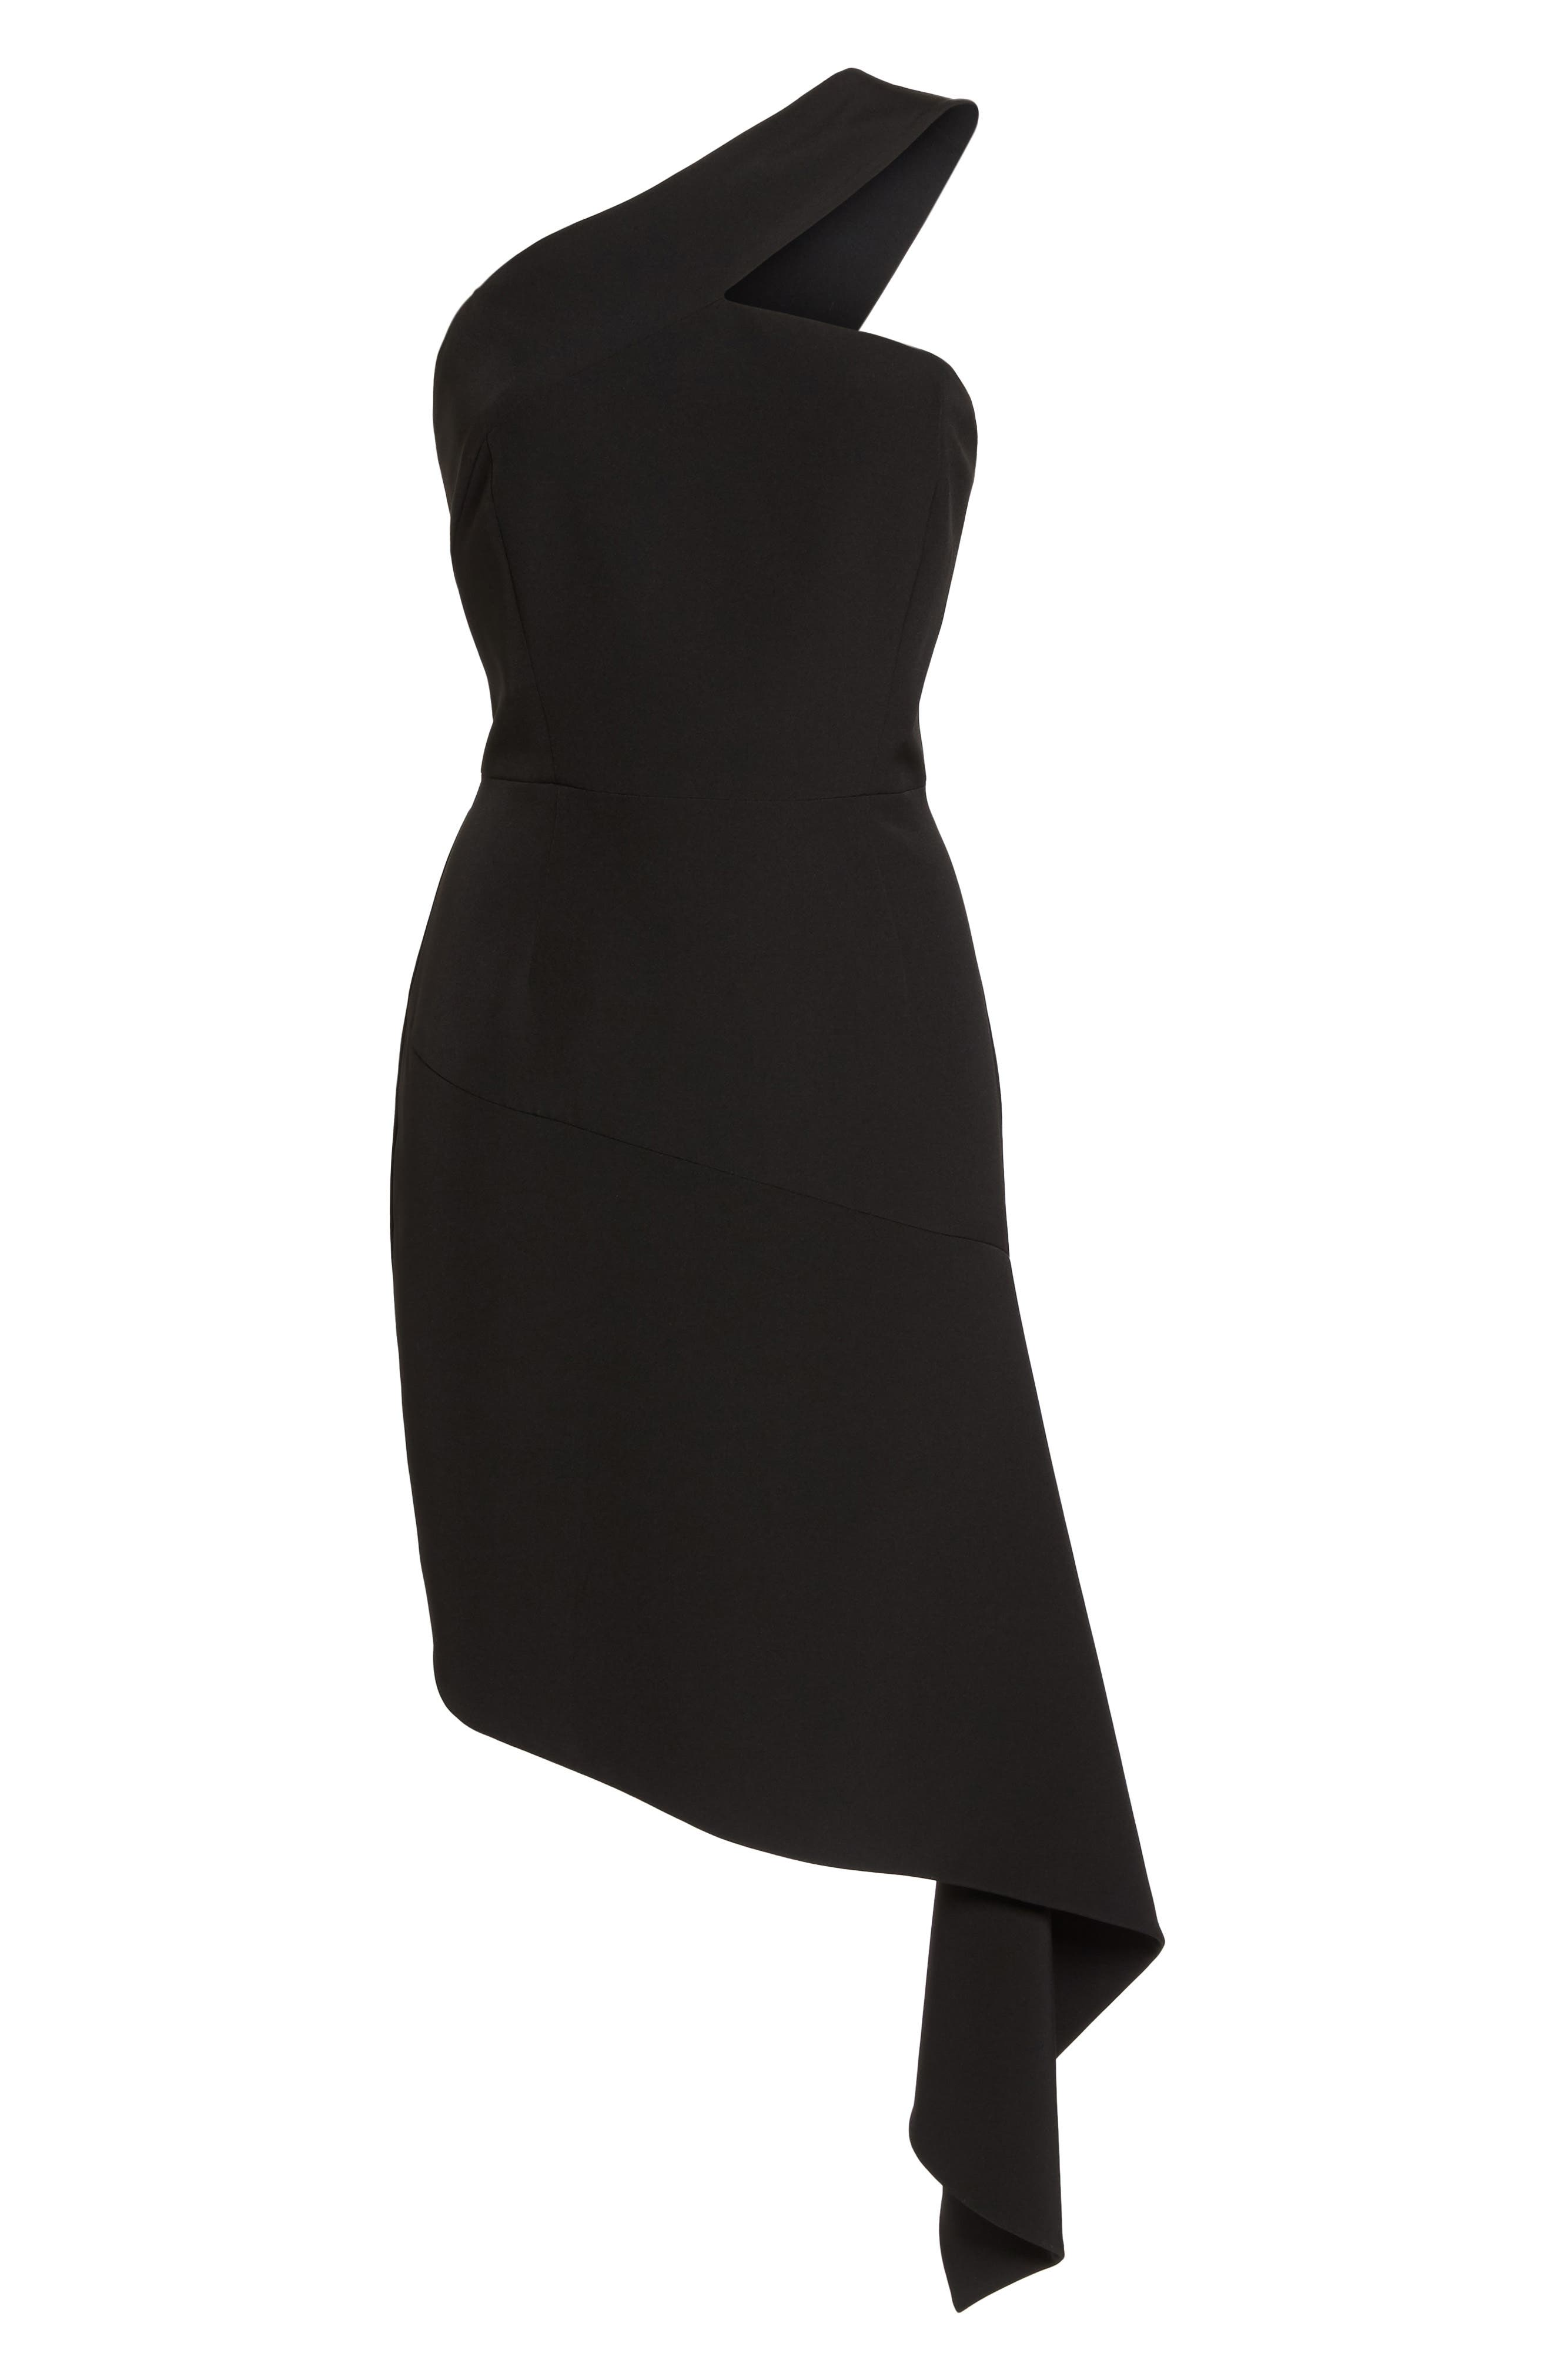 CLOVER AND SLOANE,                             One-Shoulder Asymmetric Dress,                             Alternate thumbnail 6, color,                             001